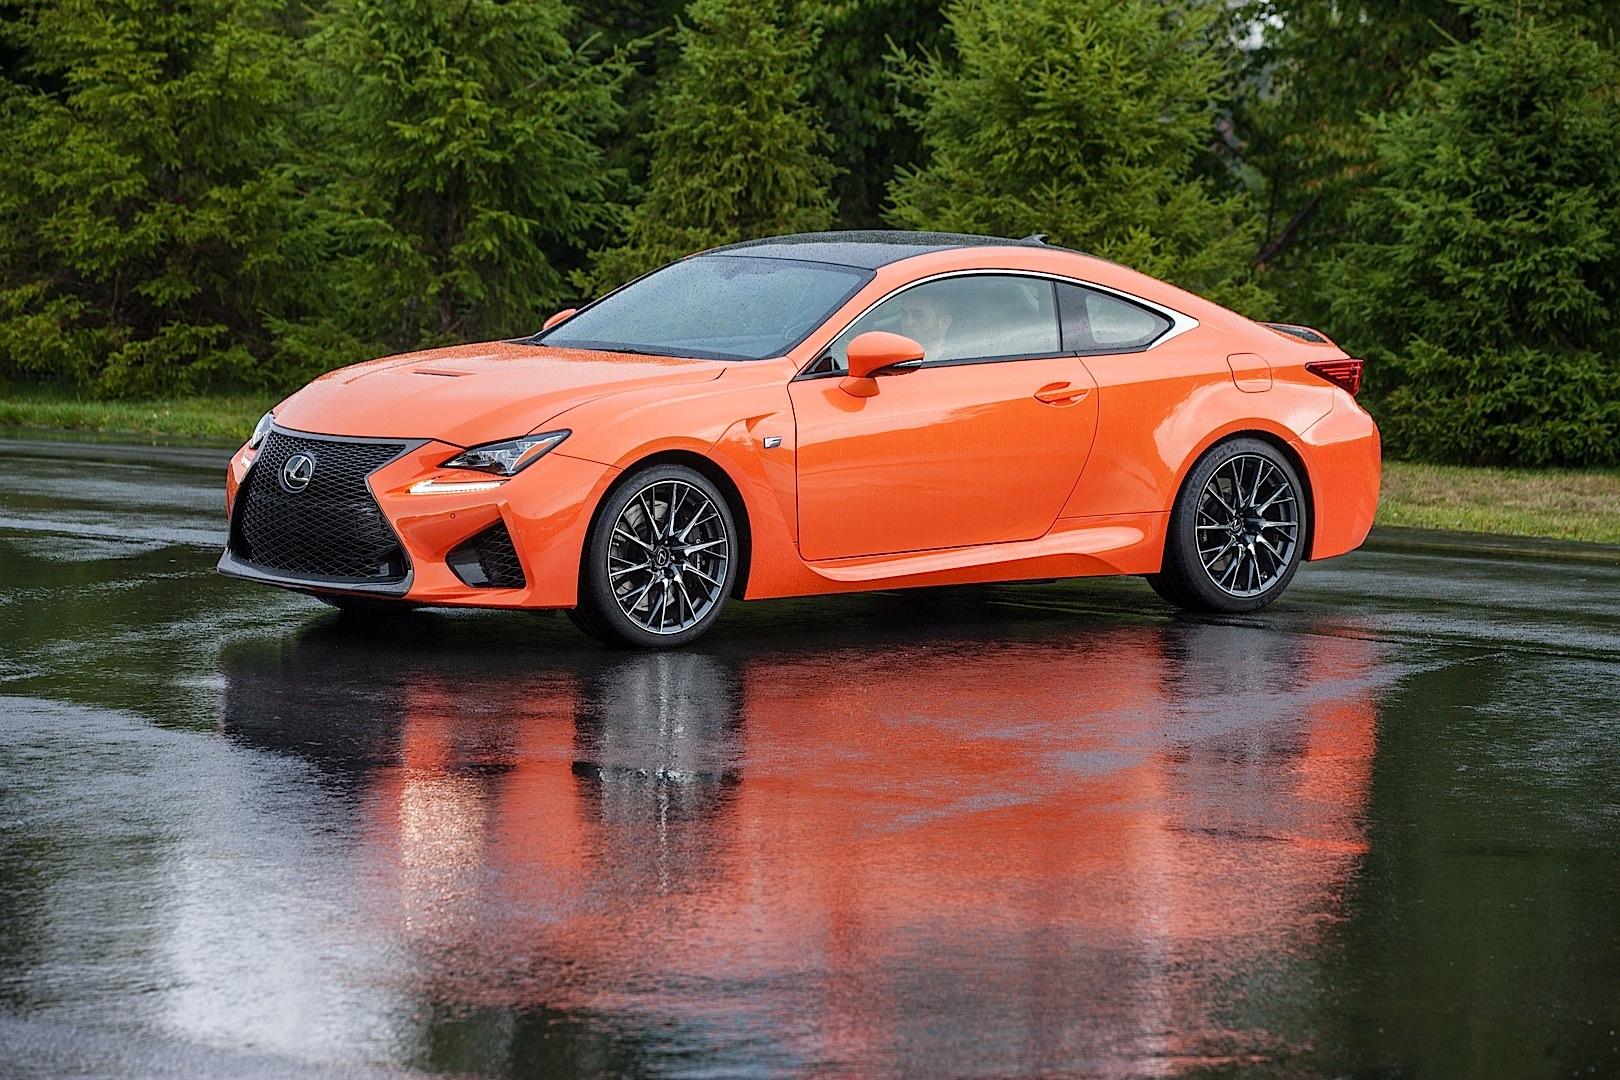 Lexus RC F Makes 467 HP Full Engine Specs And Price